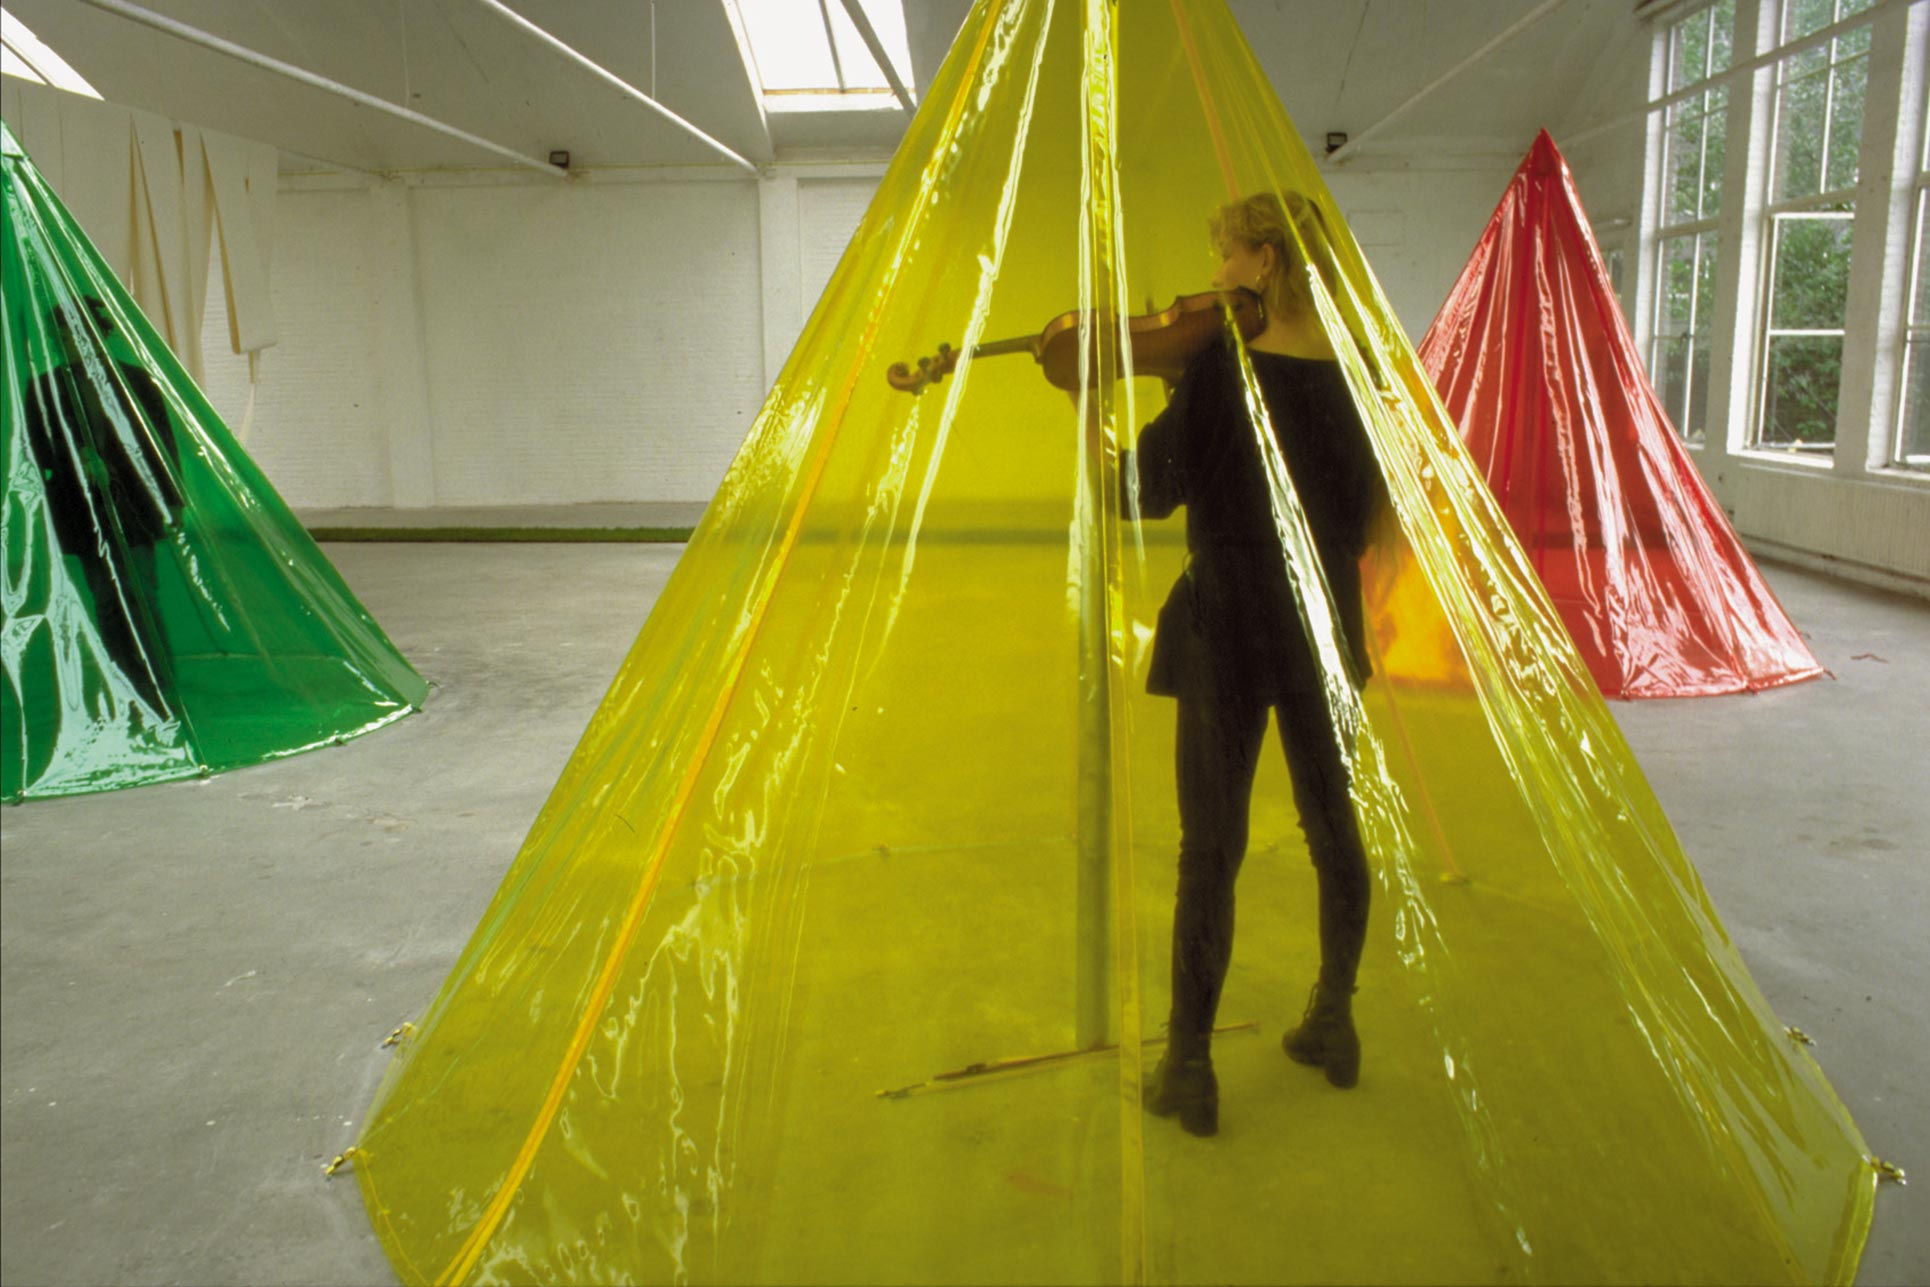 Redetour, De Fabriek Eindhoven, Charlotte Hug playing violin in Fässler's tent